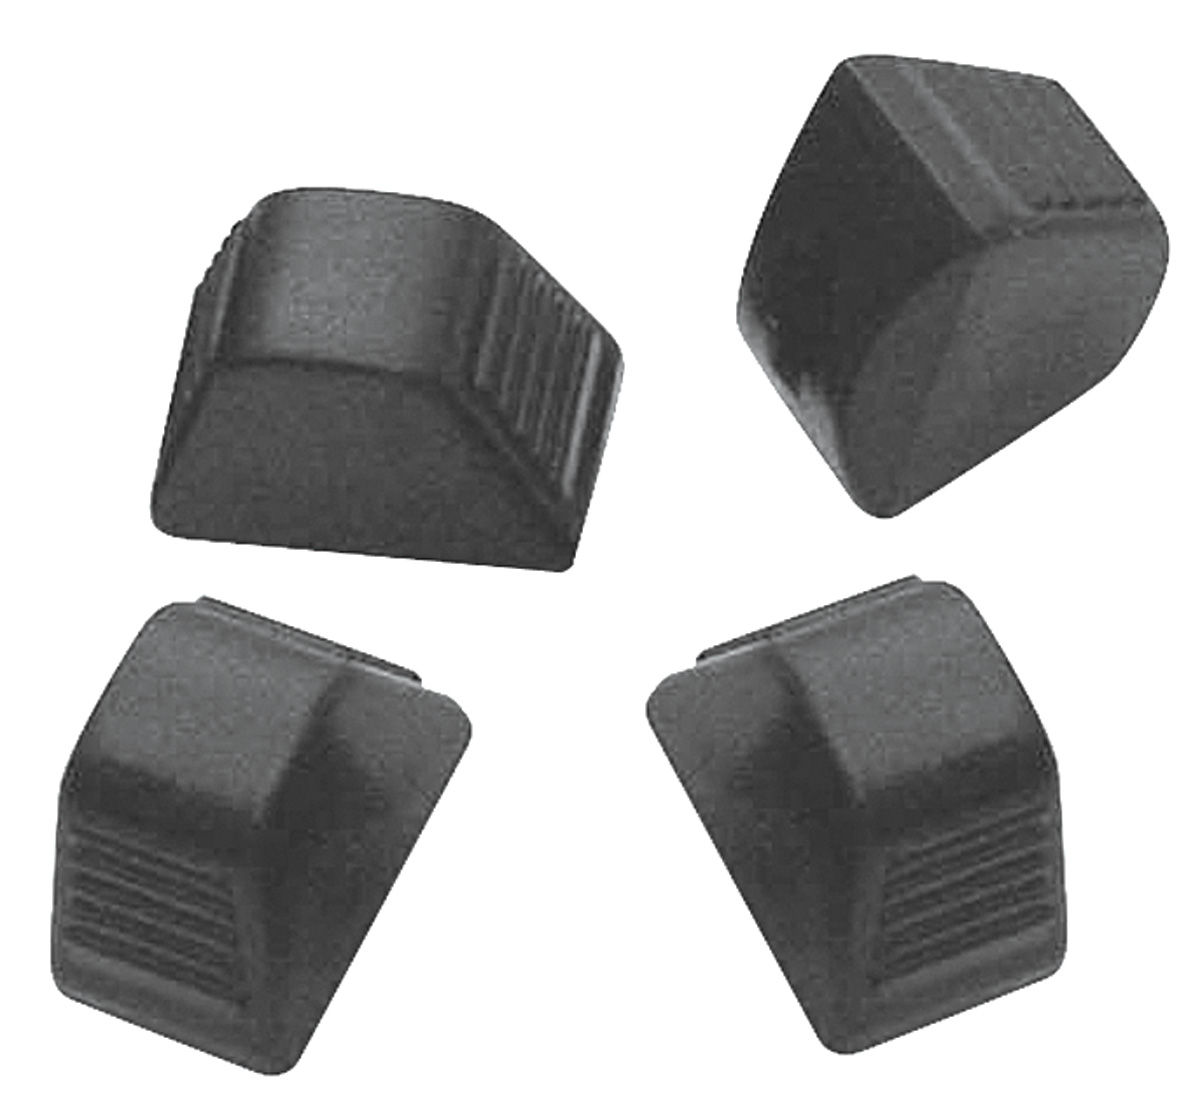 Photo of Climate Control Knob Black AC knob (4-piece)